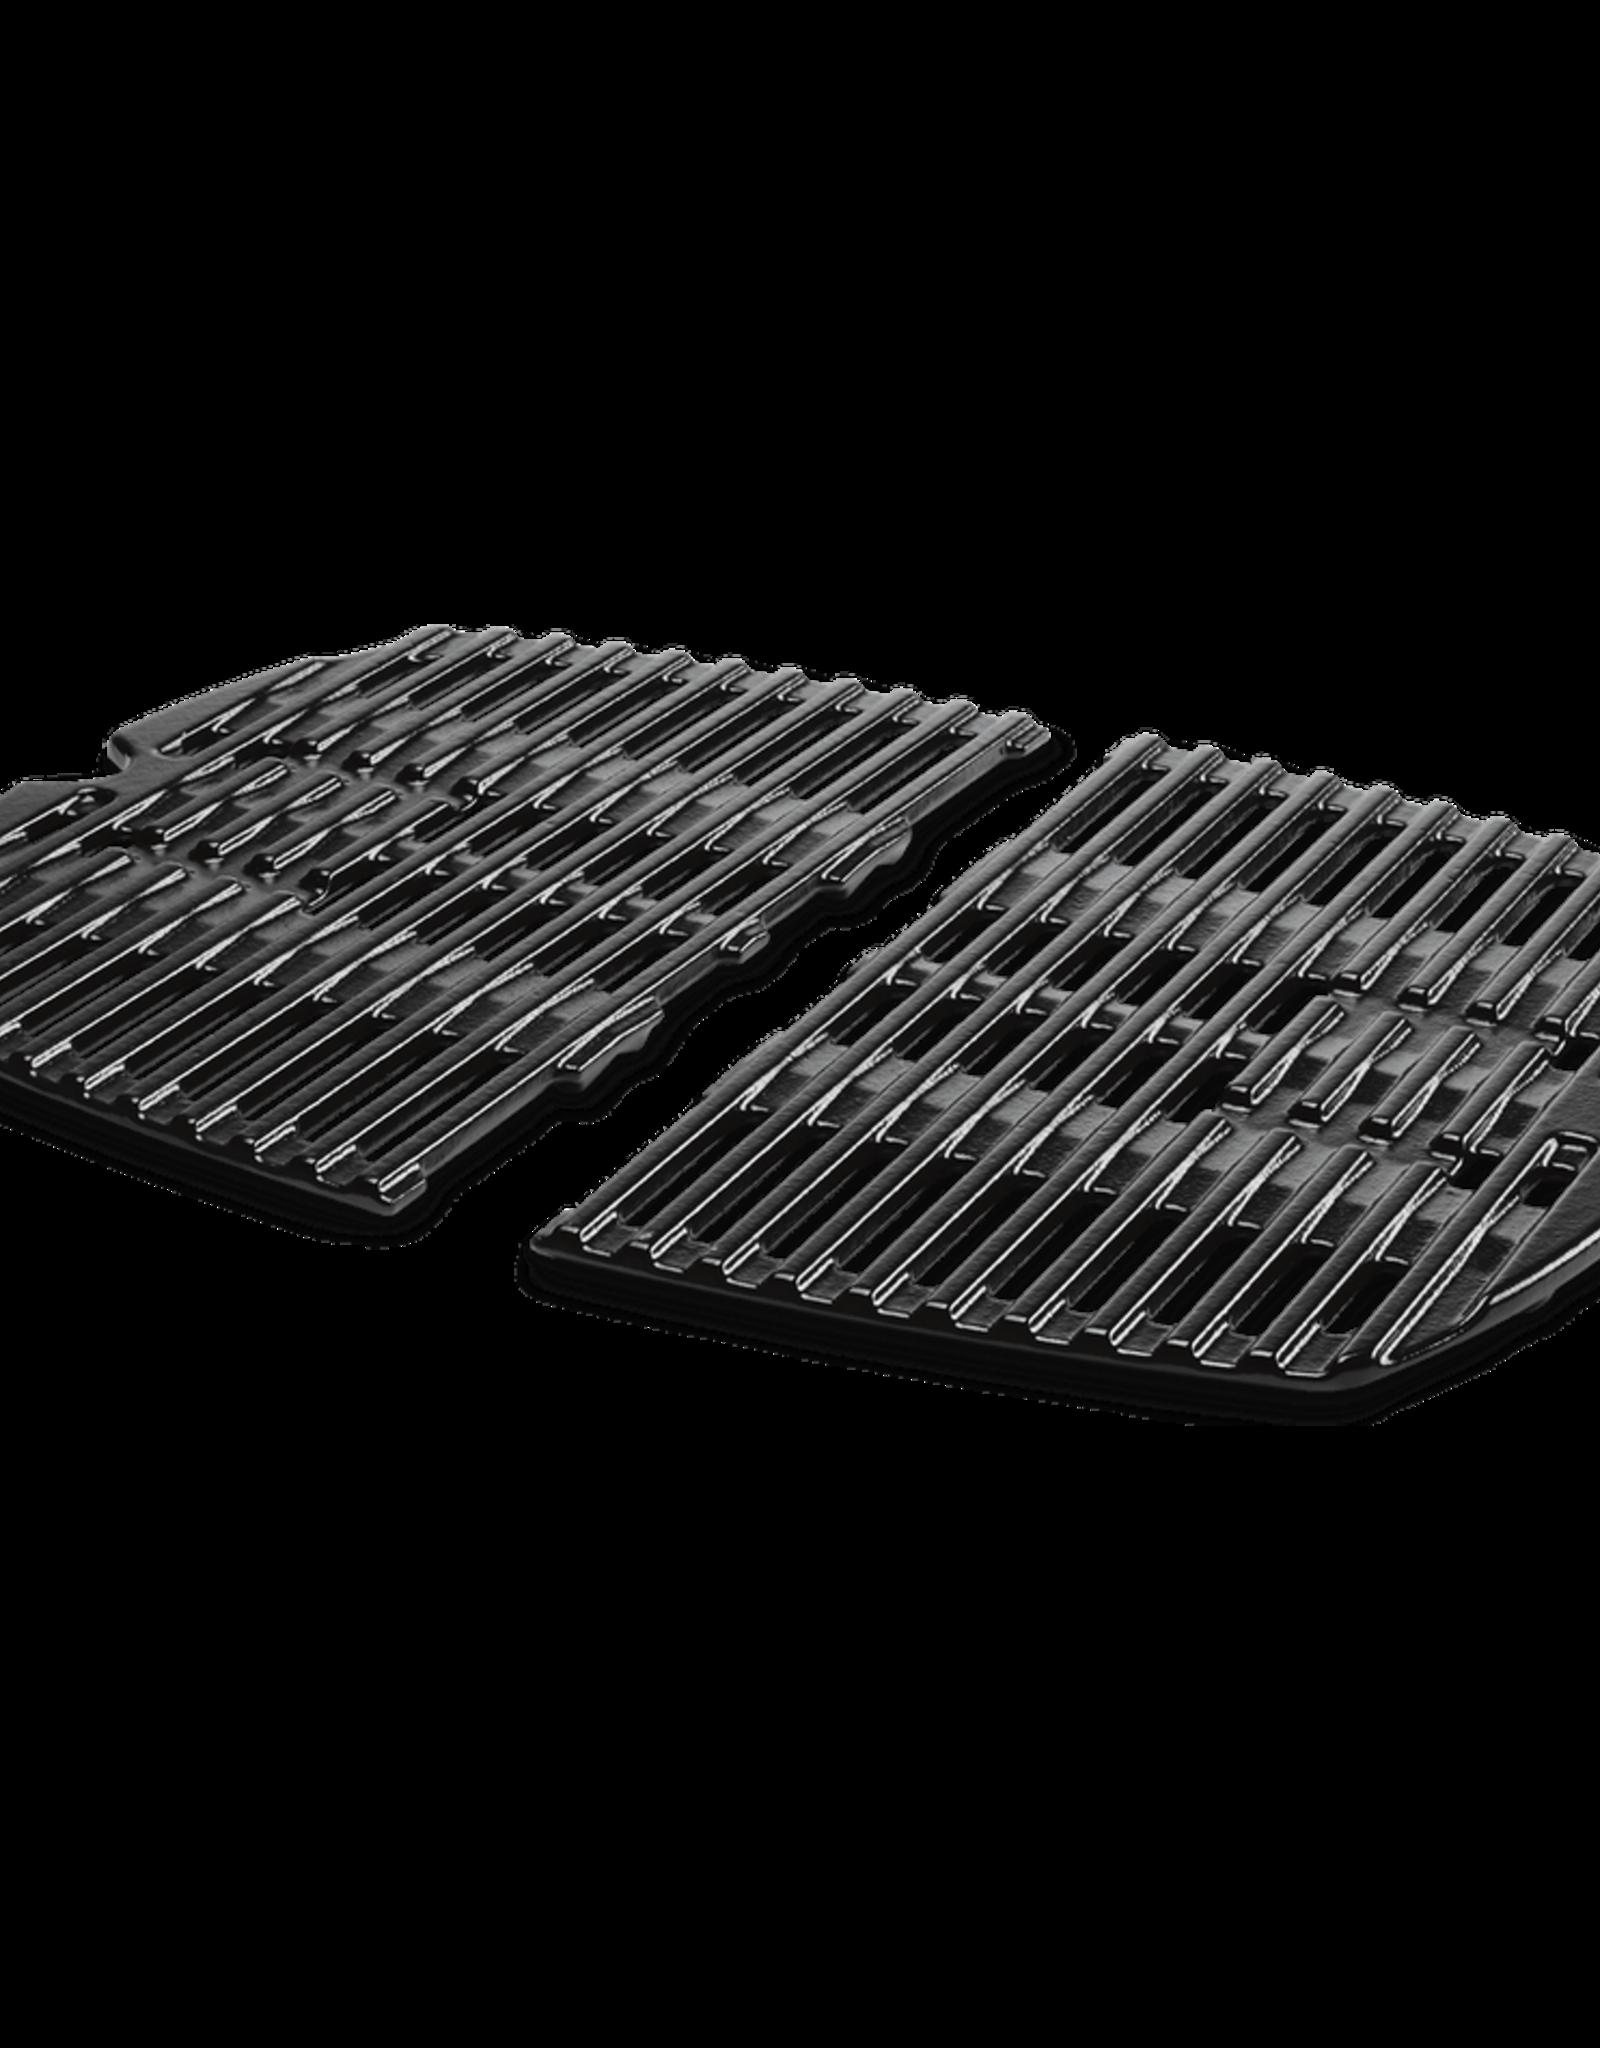 Weber Cooking Grates - Fits Weber Q® 100/1000 series